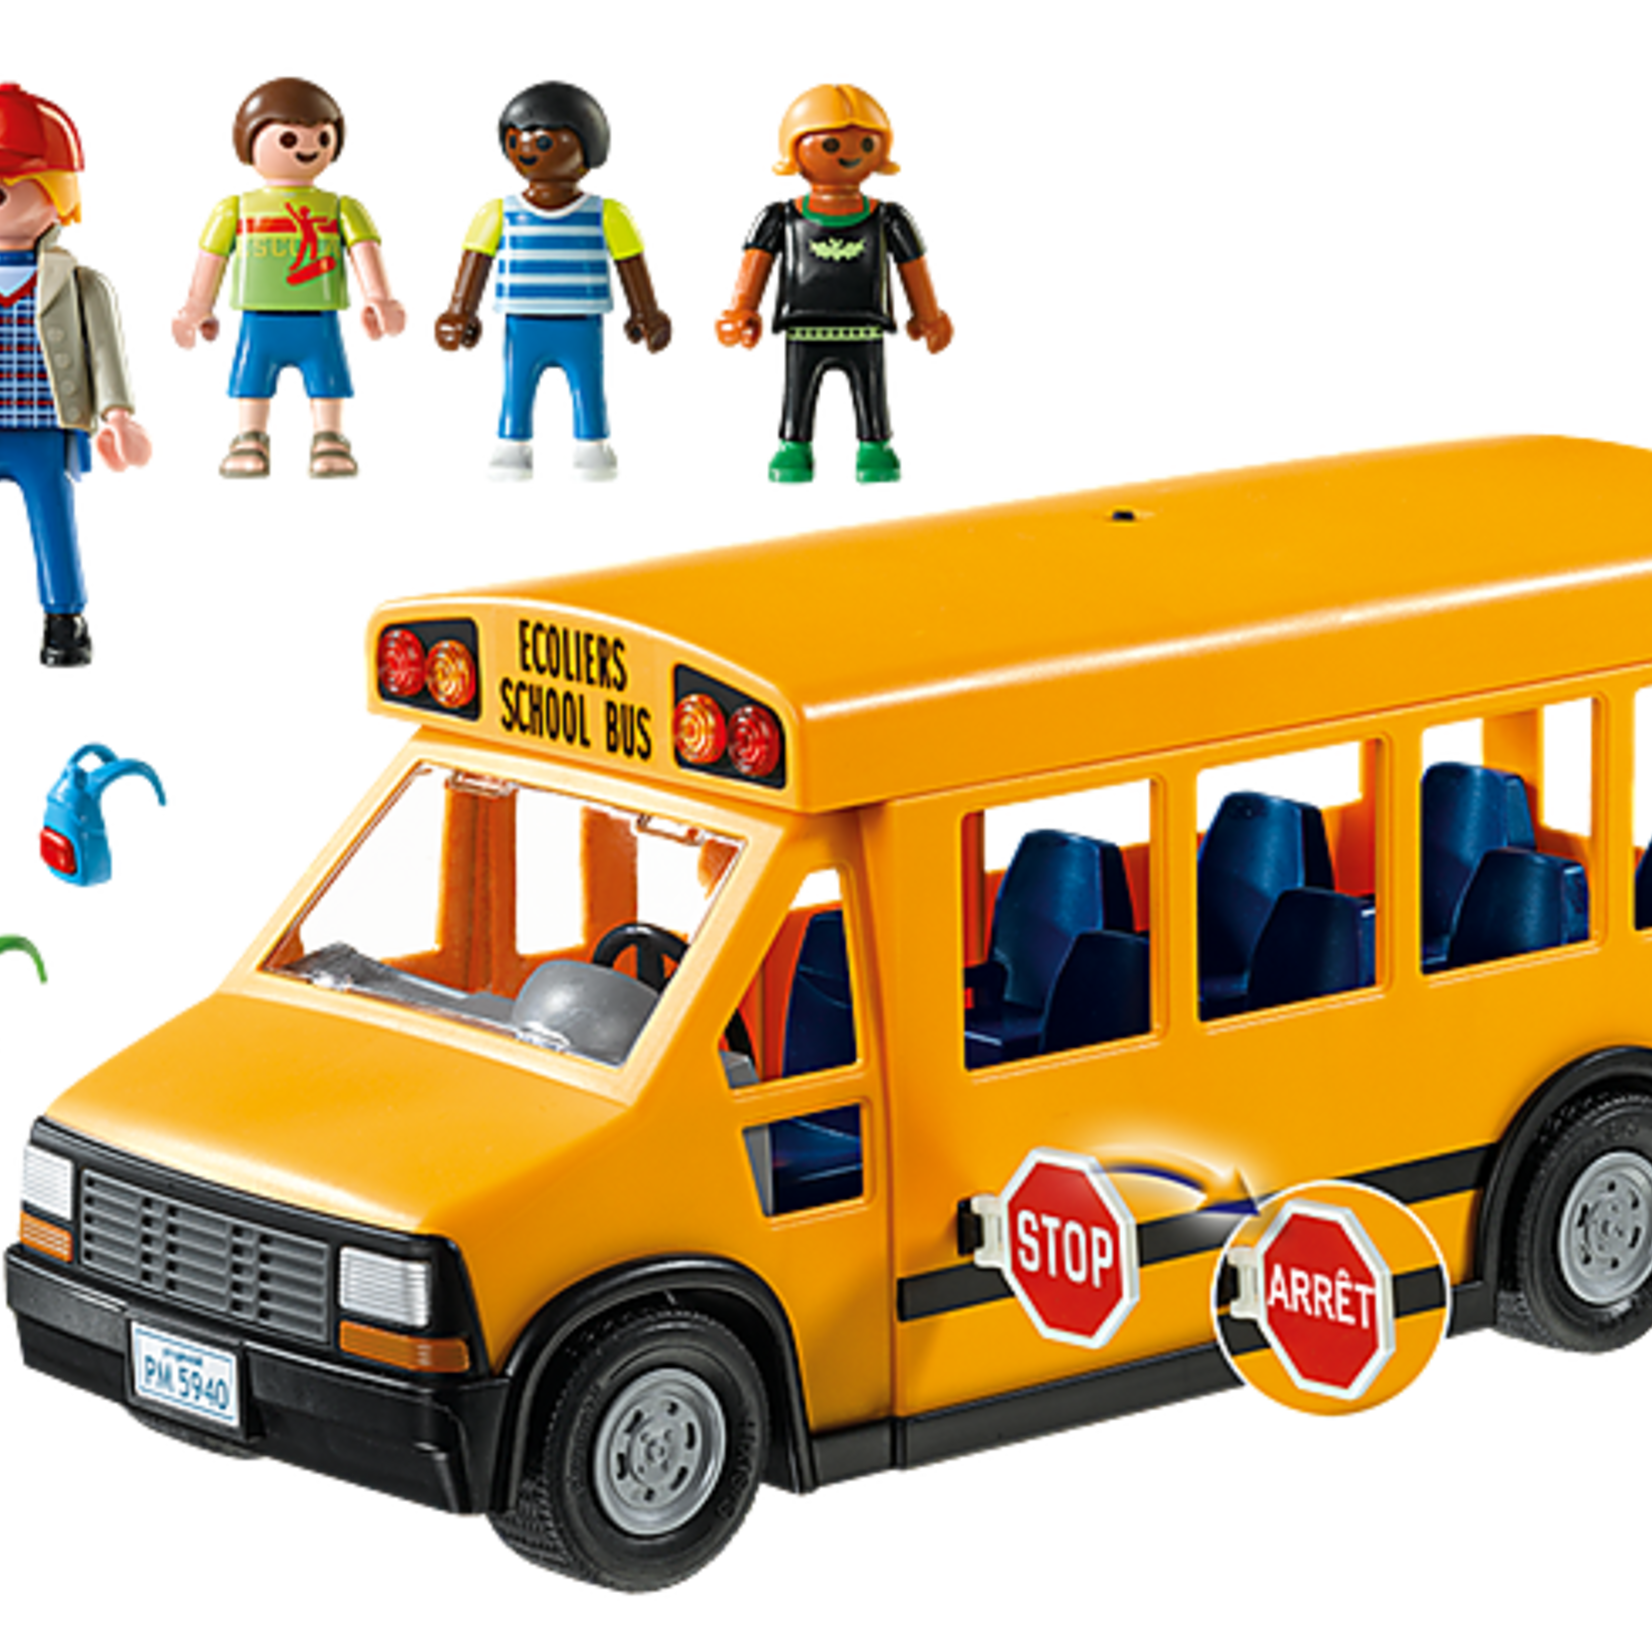 Playmobil School Bus - Playmobil 5680